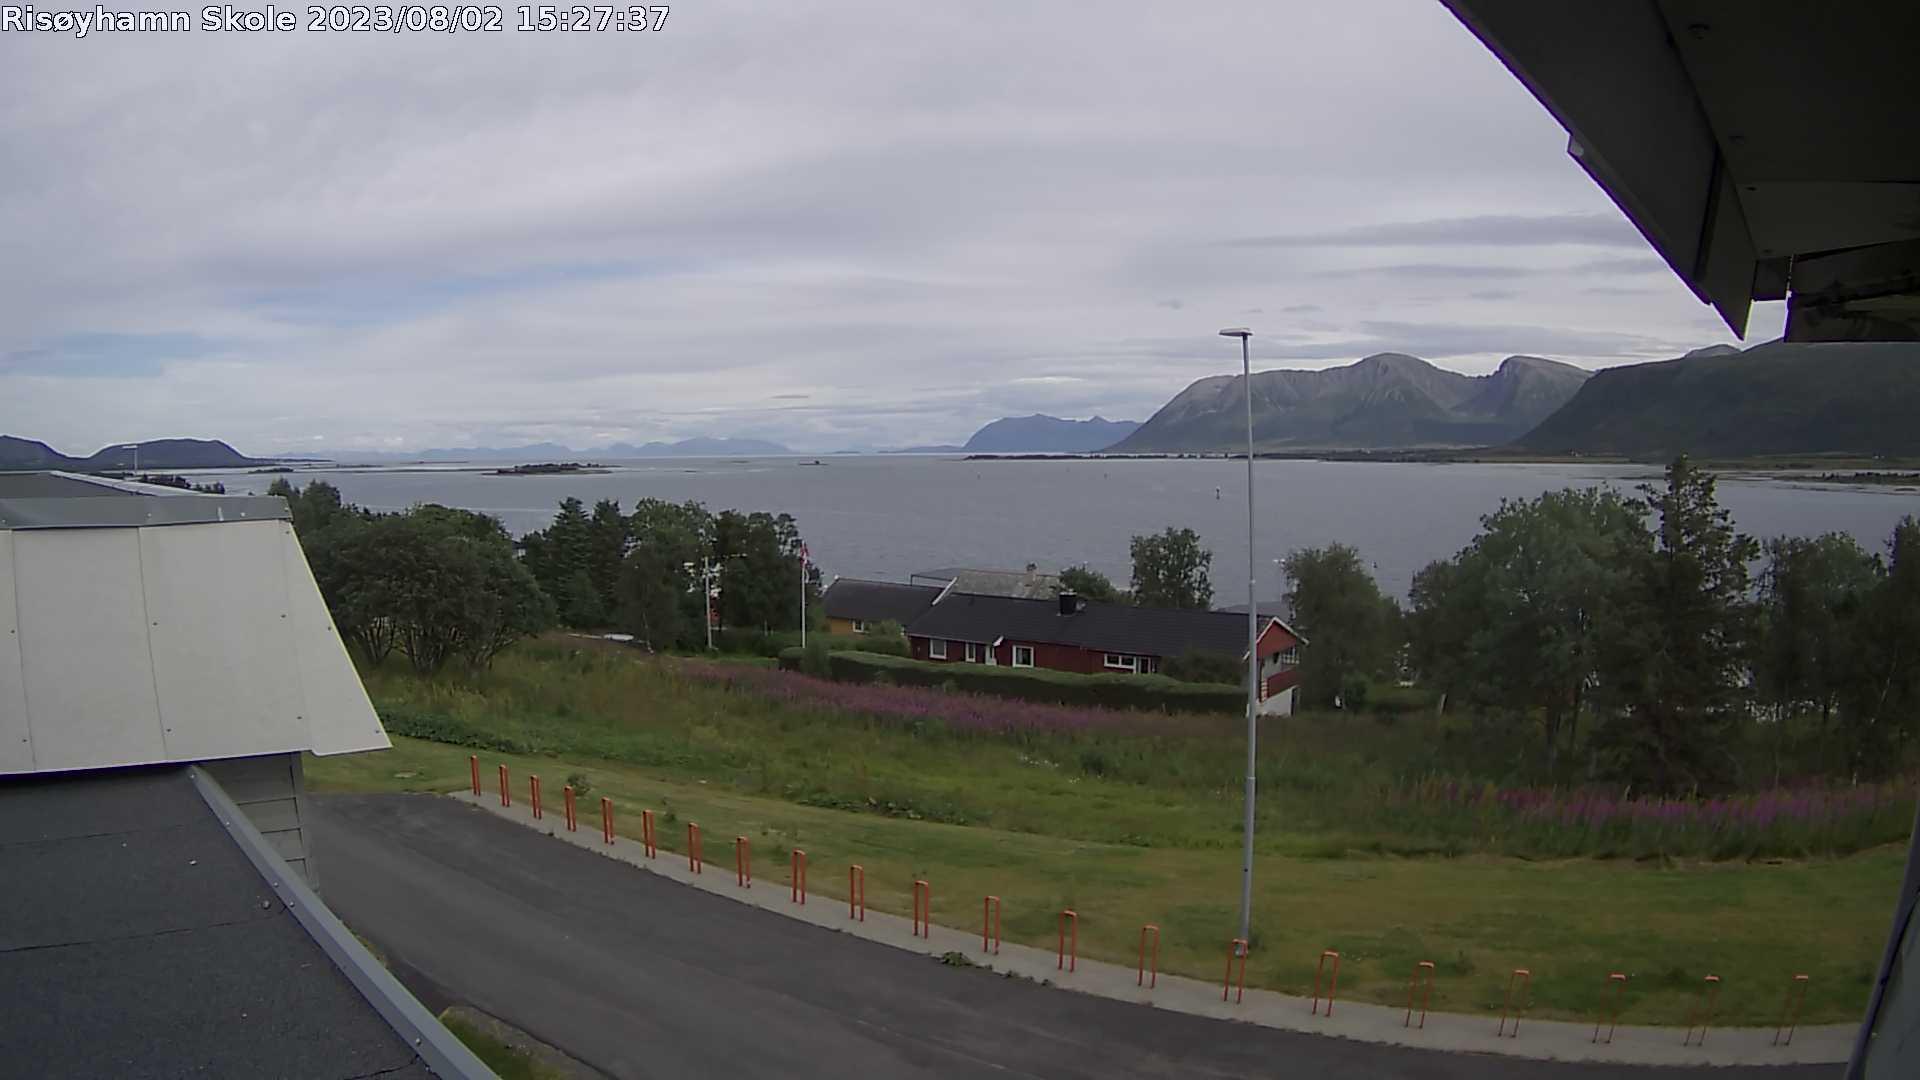 Webcam Risøyhamn › North-East